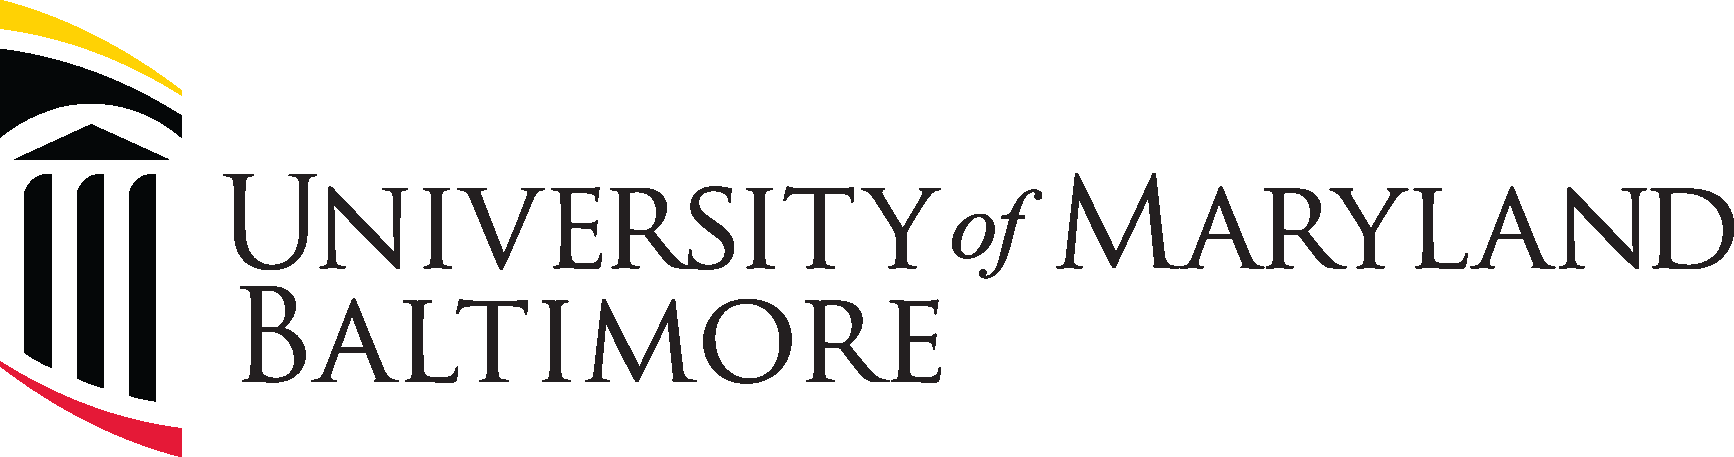 university of maryland baltimore